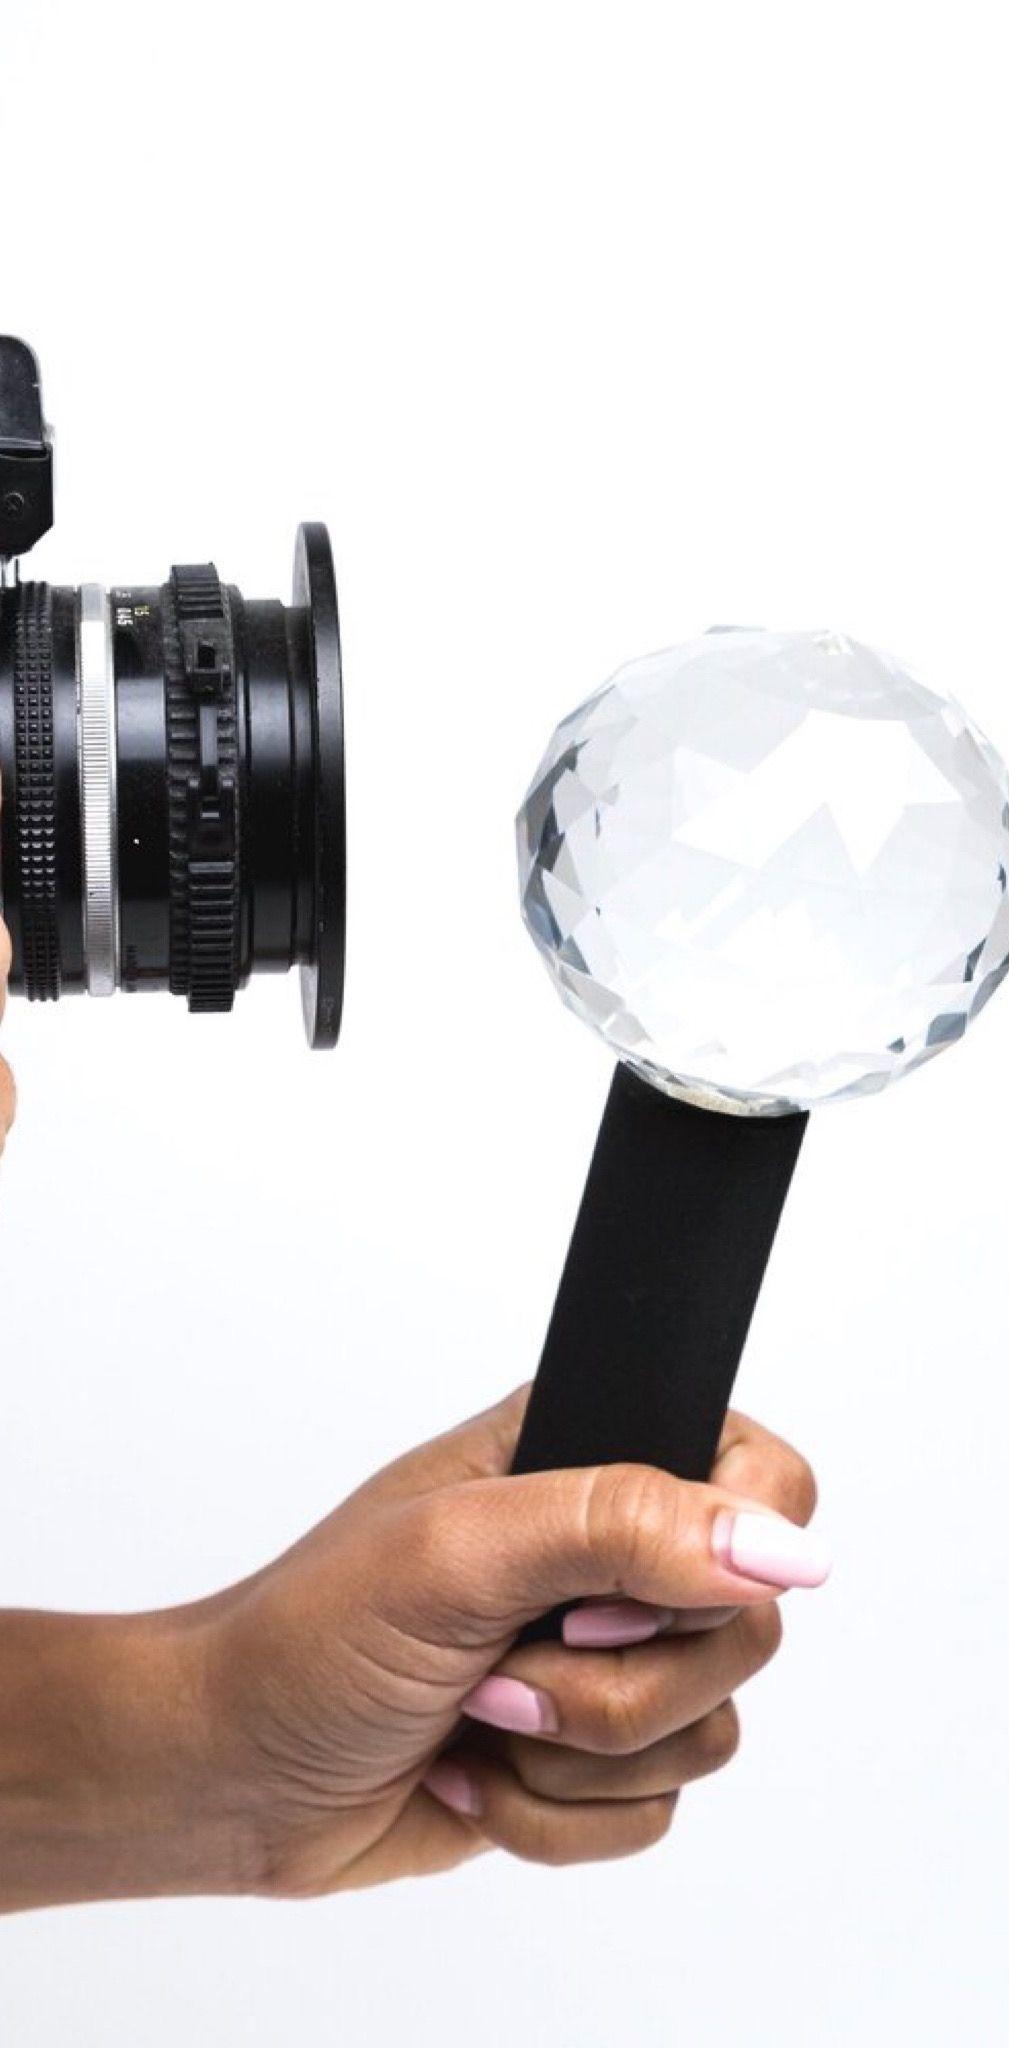 #prismlensfx #orbprism #photographyeveryday #filmmakers #filmphotography #photographer